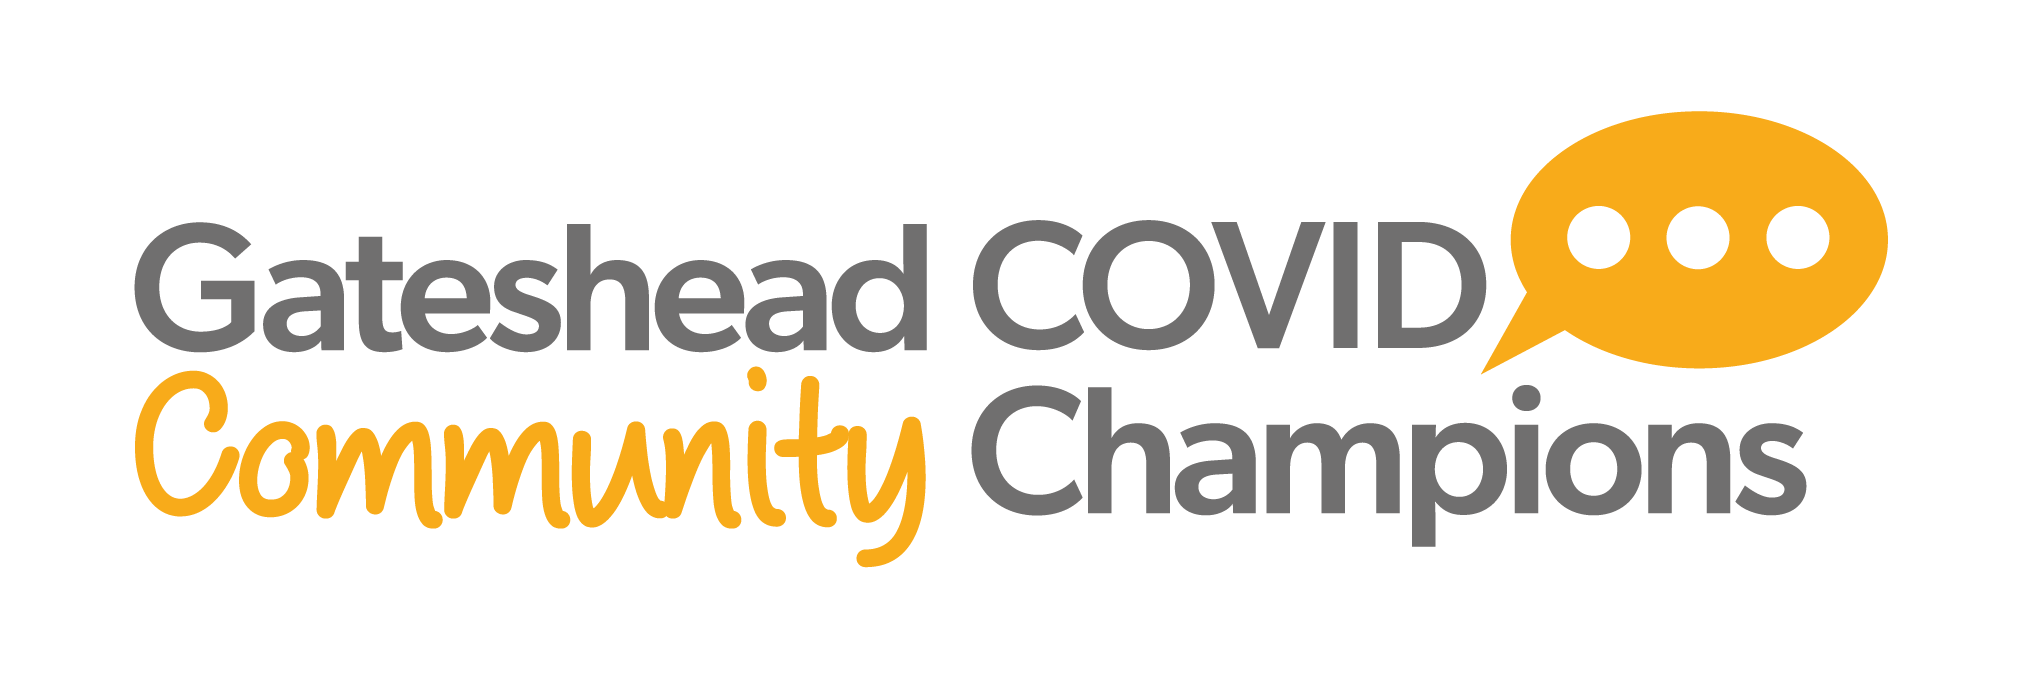 Covid champions header